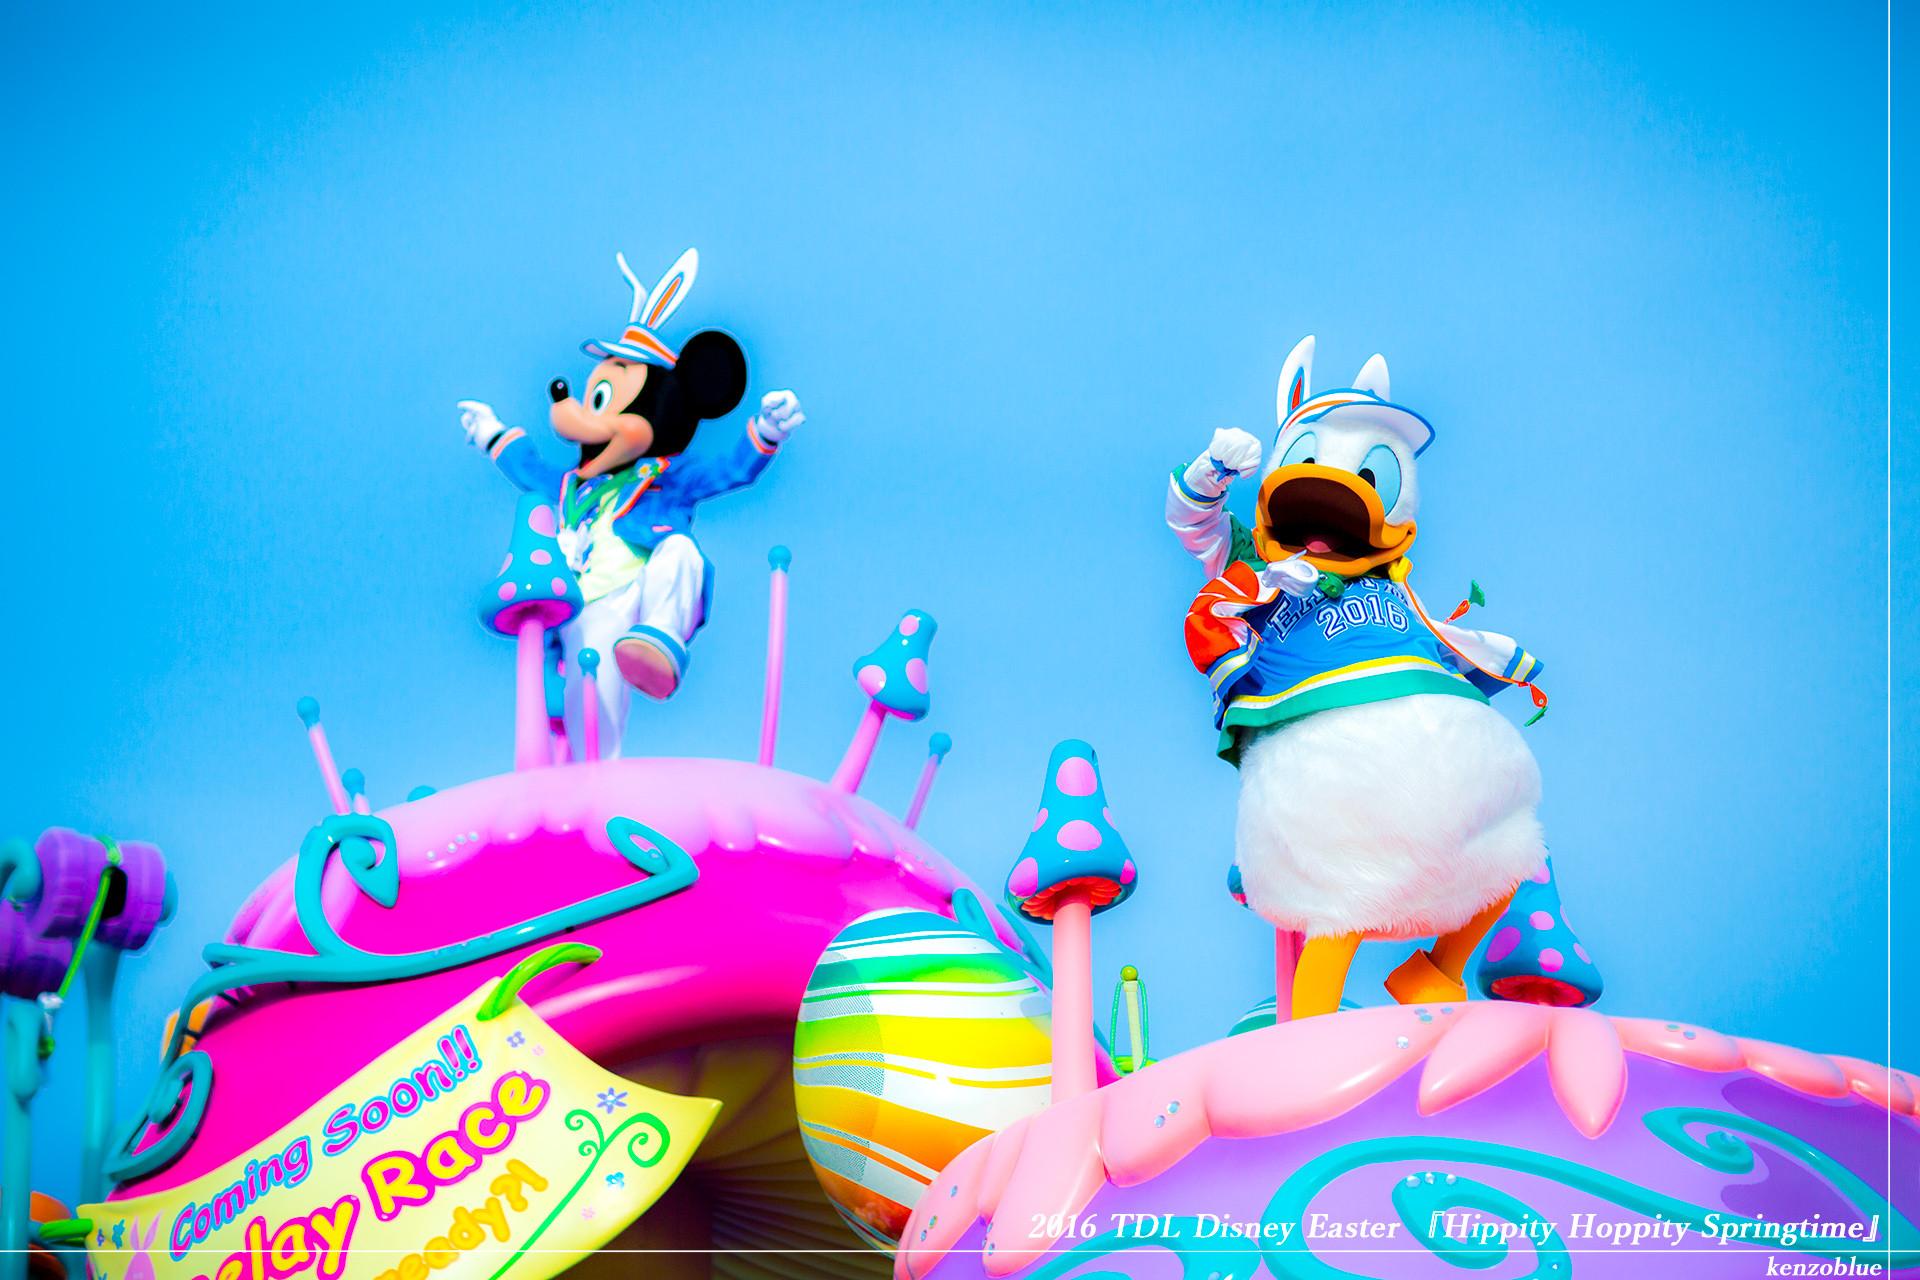 ドナ散歩『Hippity-Hoppity-Springtime』001